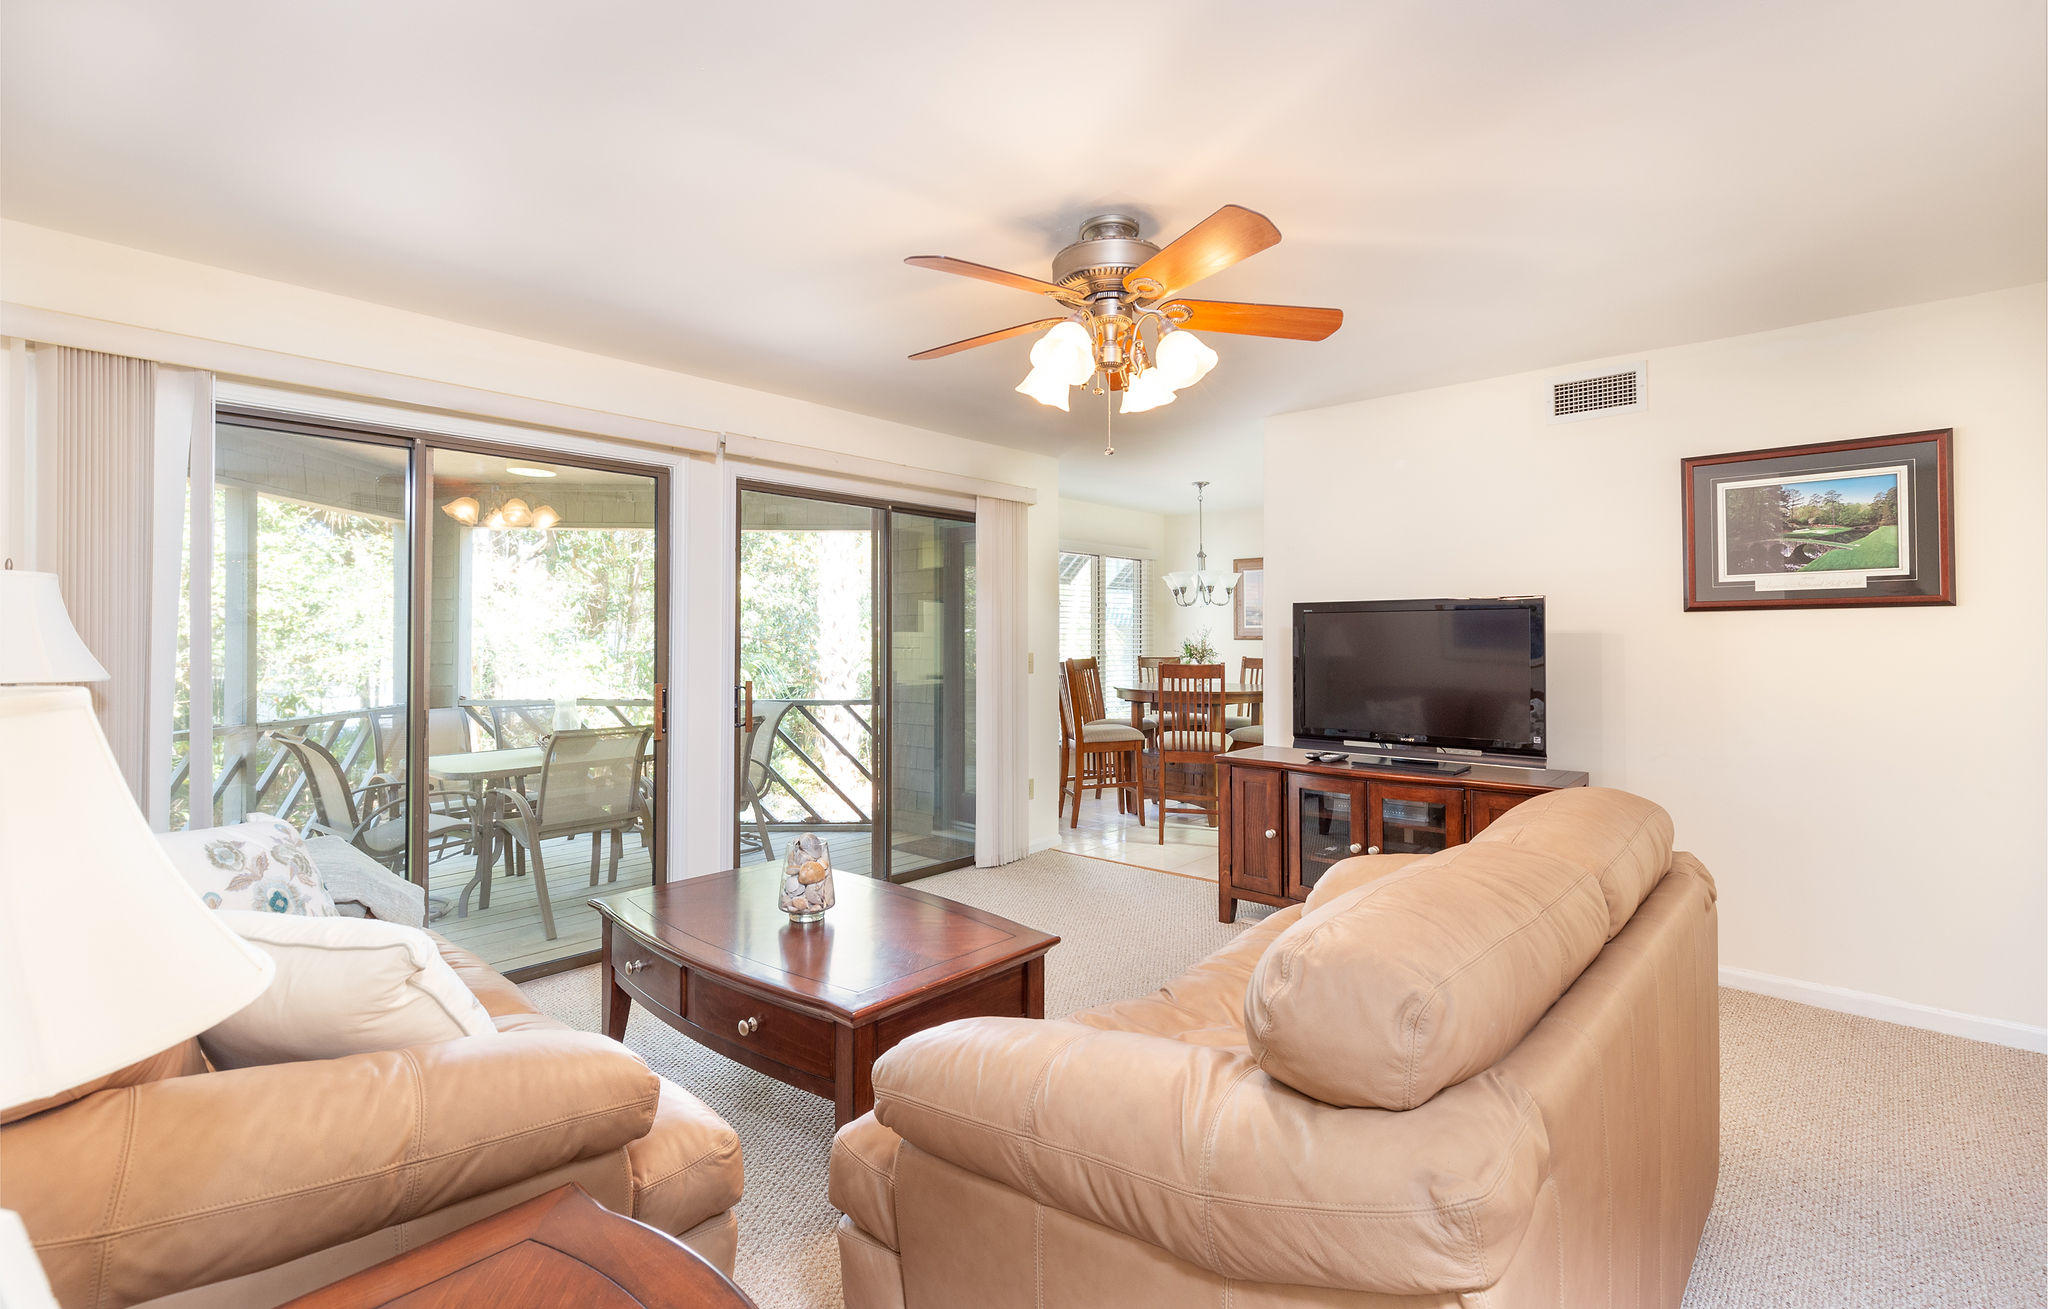 Kiawah Island Homes For Sale - 4767 Tennis Club, Kiawah Island, SC - 9